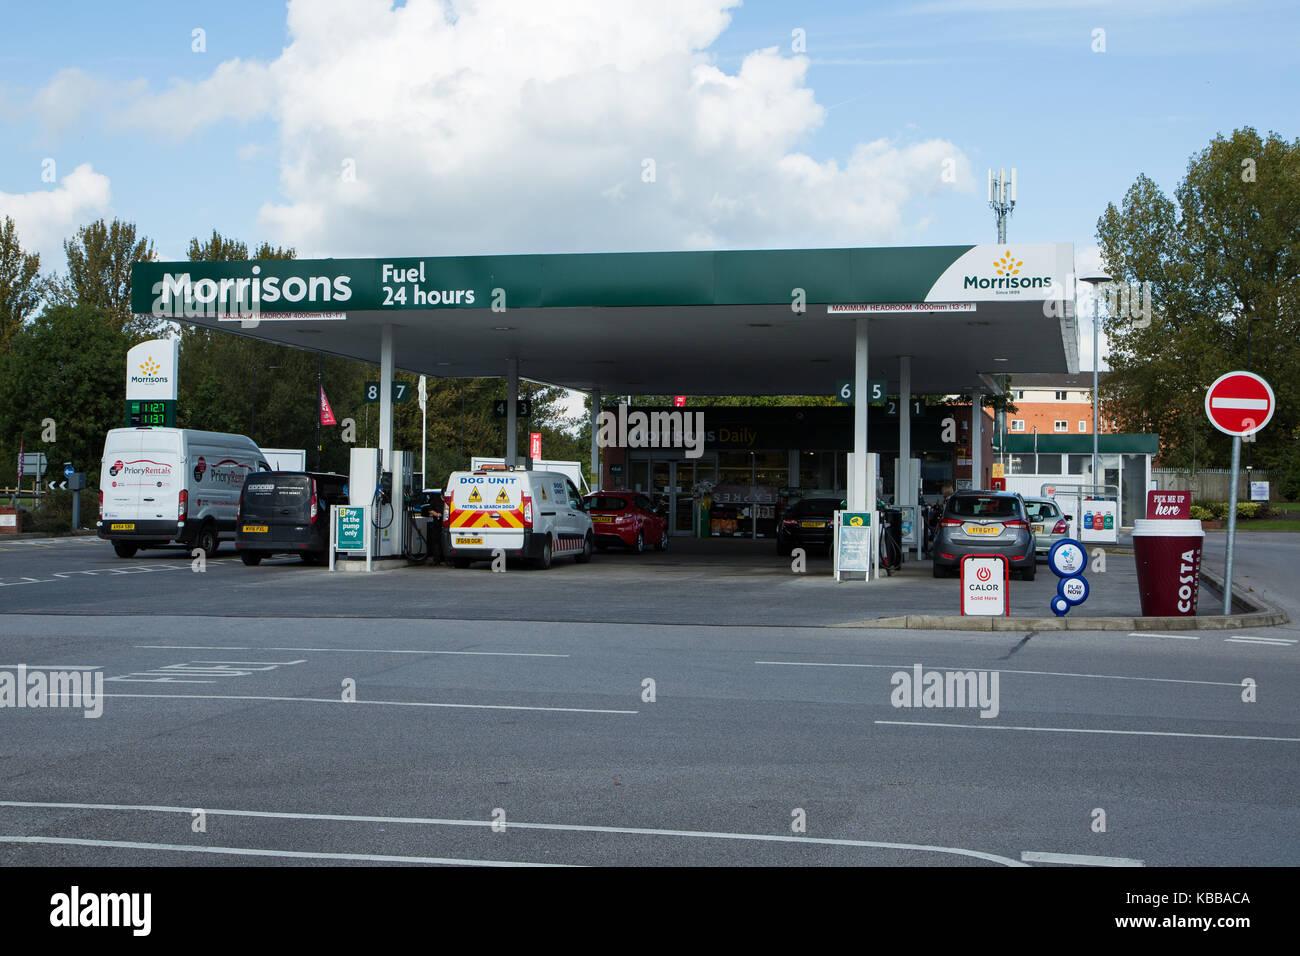 Uk petrol station shop stock photos uk petrol station shop stock images alamy - Esso garage opening times ...